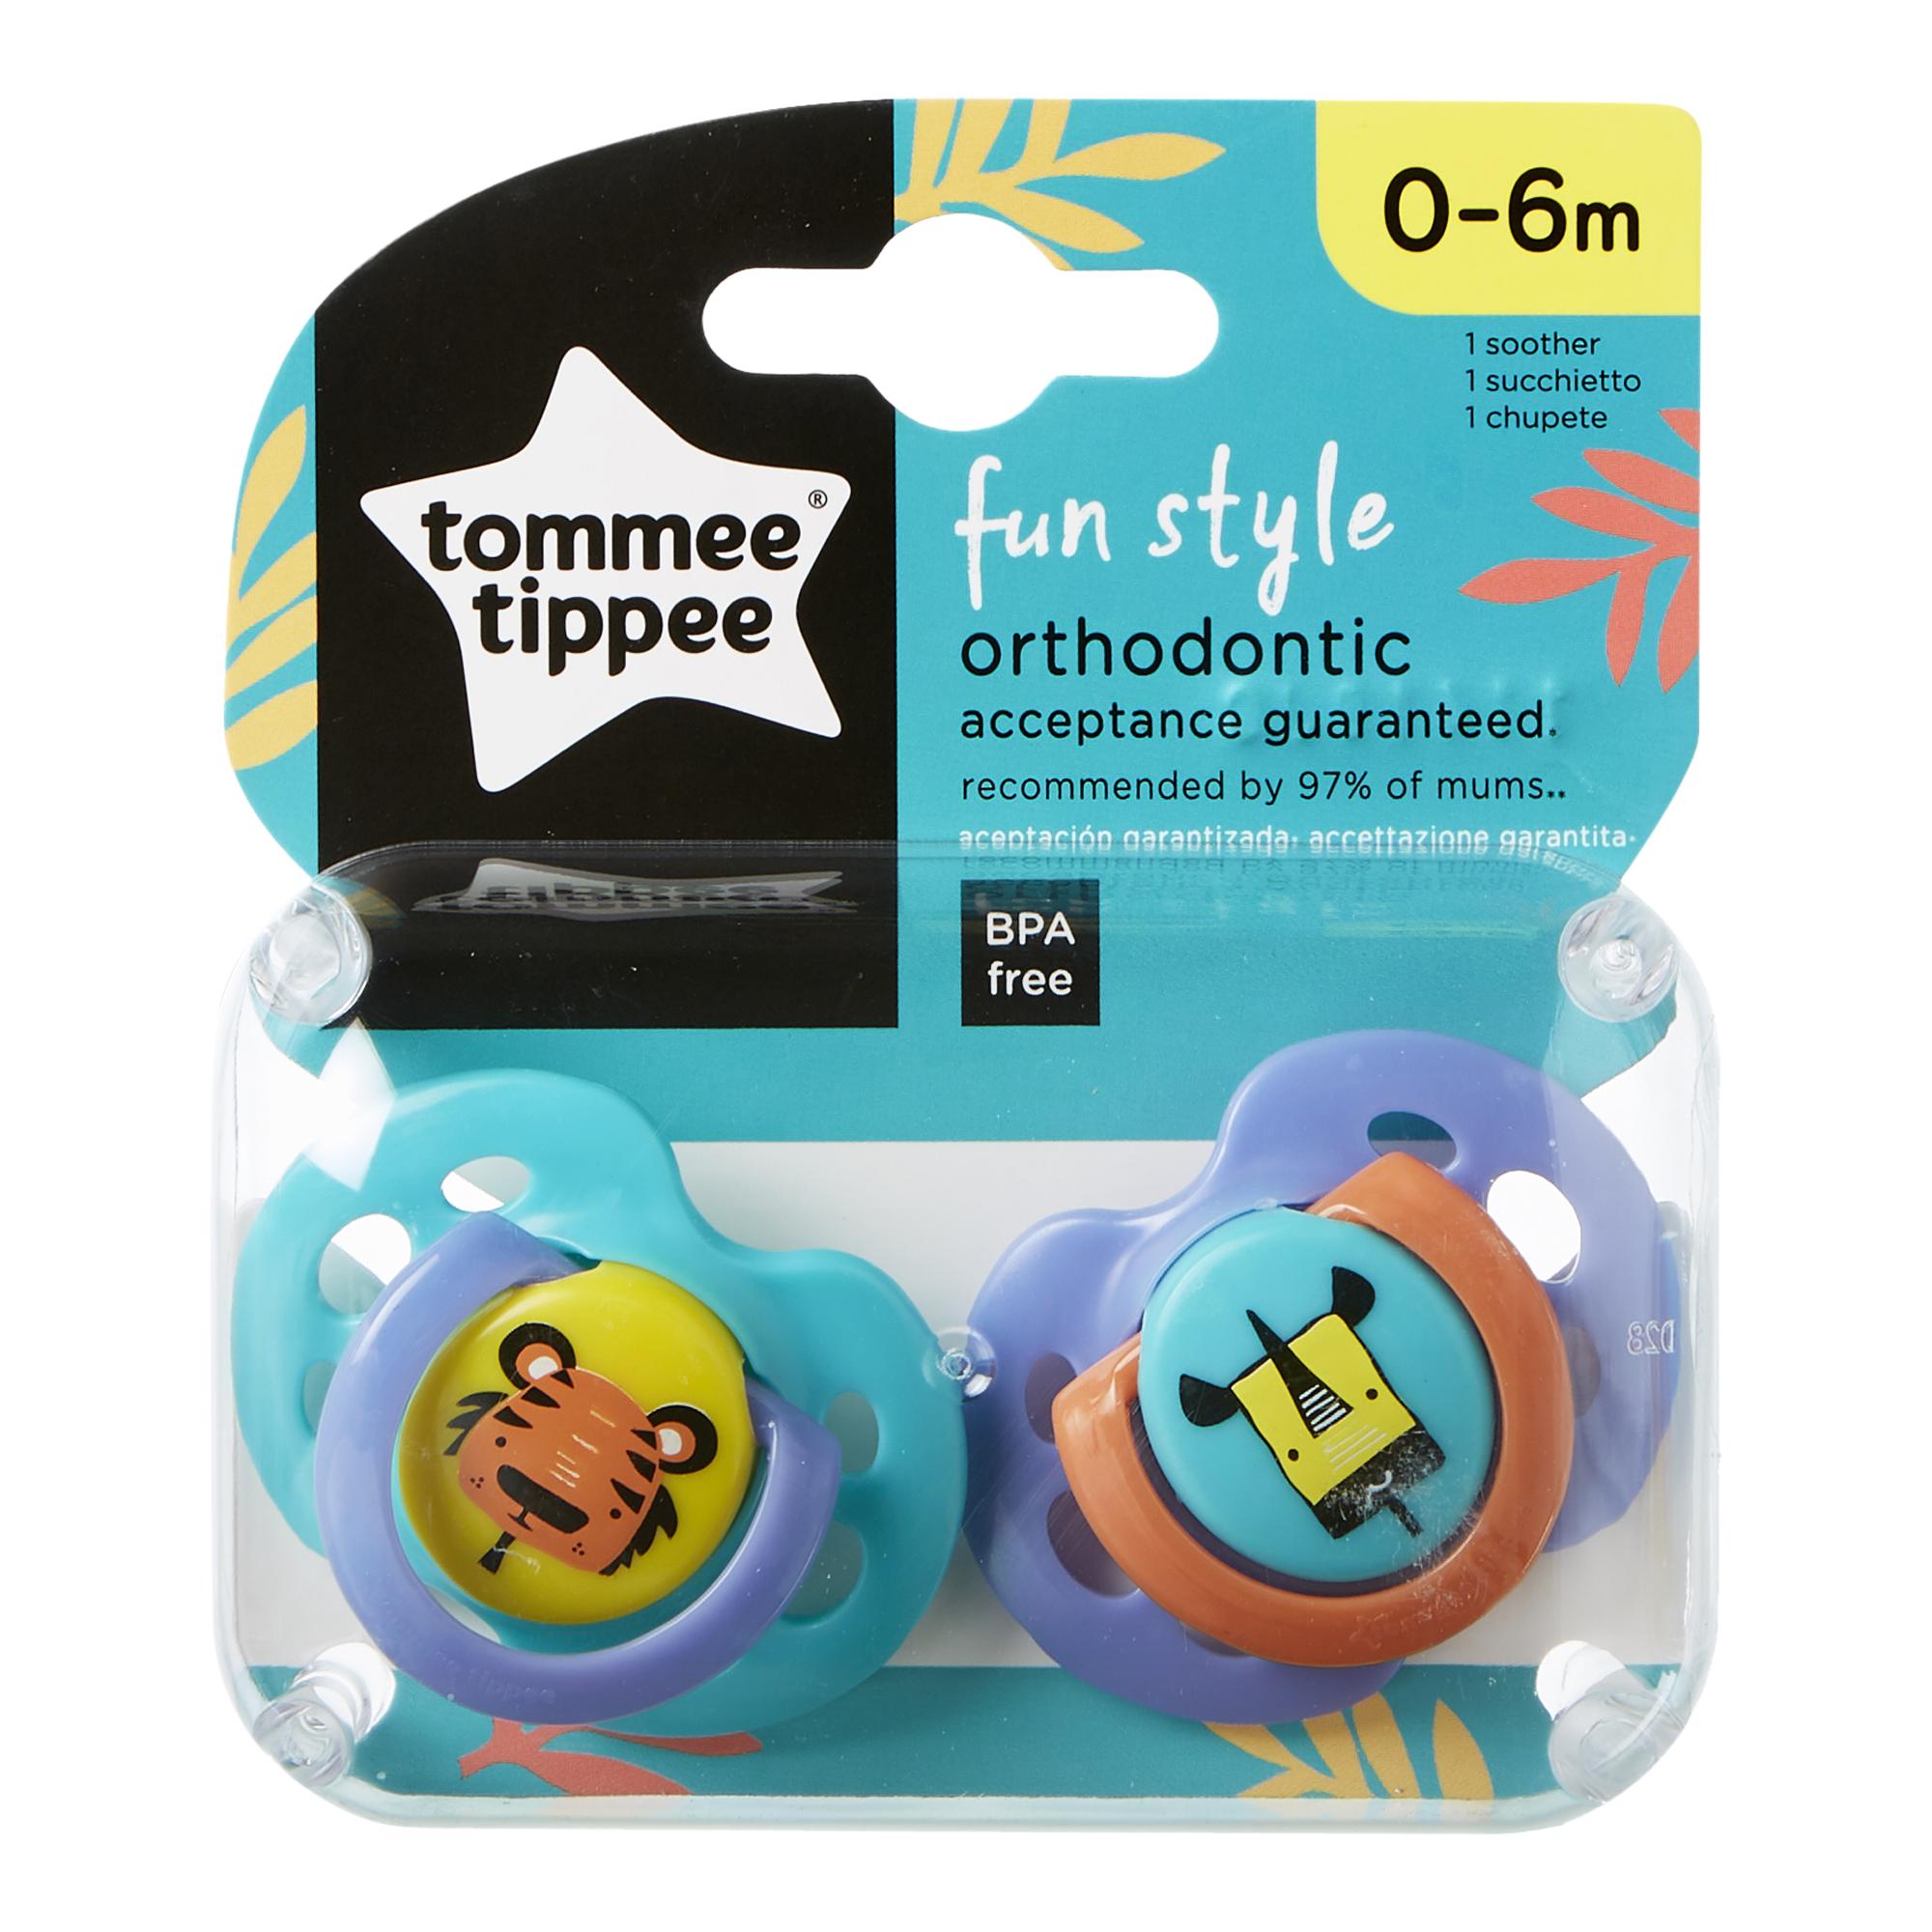 Set Suzete Ortodontice de Zi FUN, Tommee Tippee, 0-6 Luni, 2 buc, Tigru / Girafa